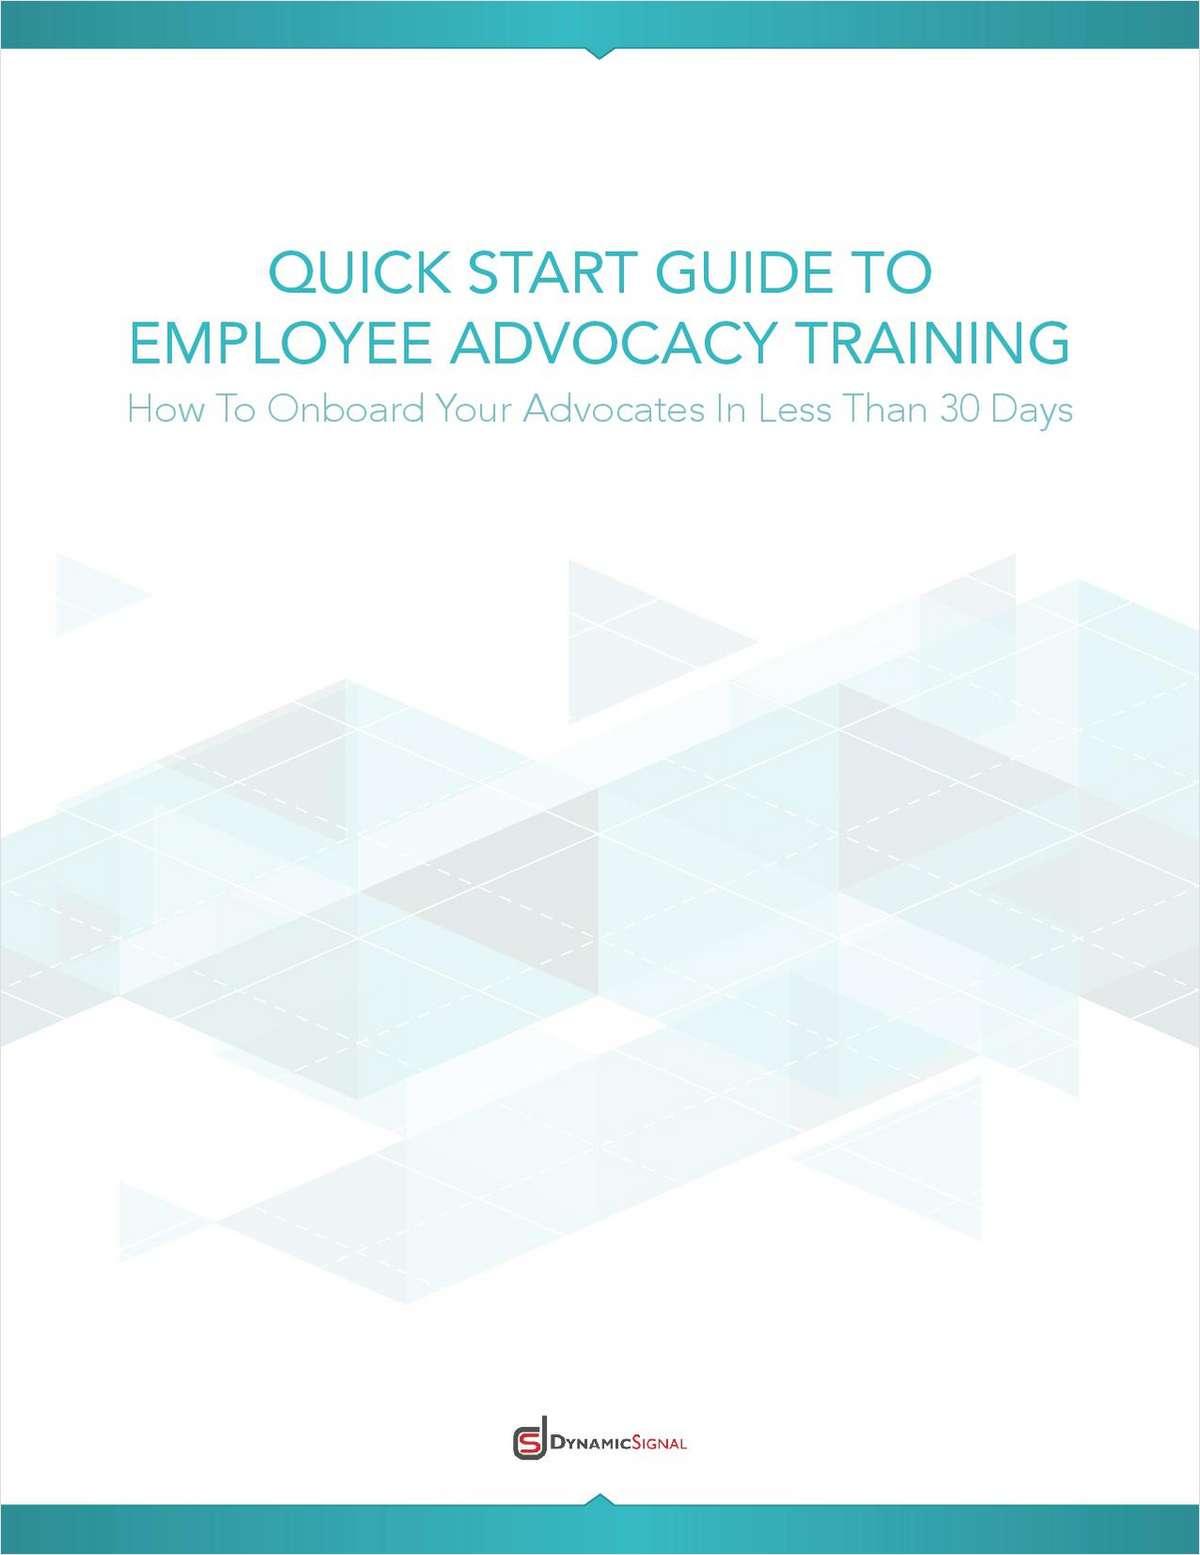 Quick Start Guide: Employee Advocacy Training